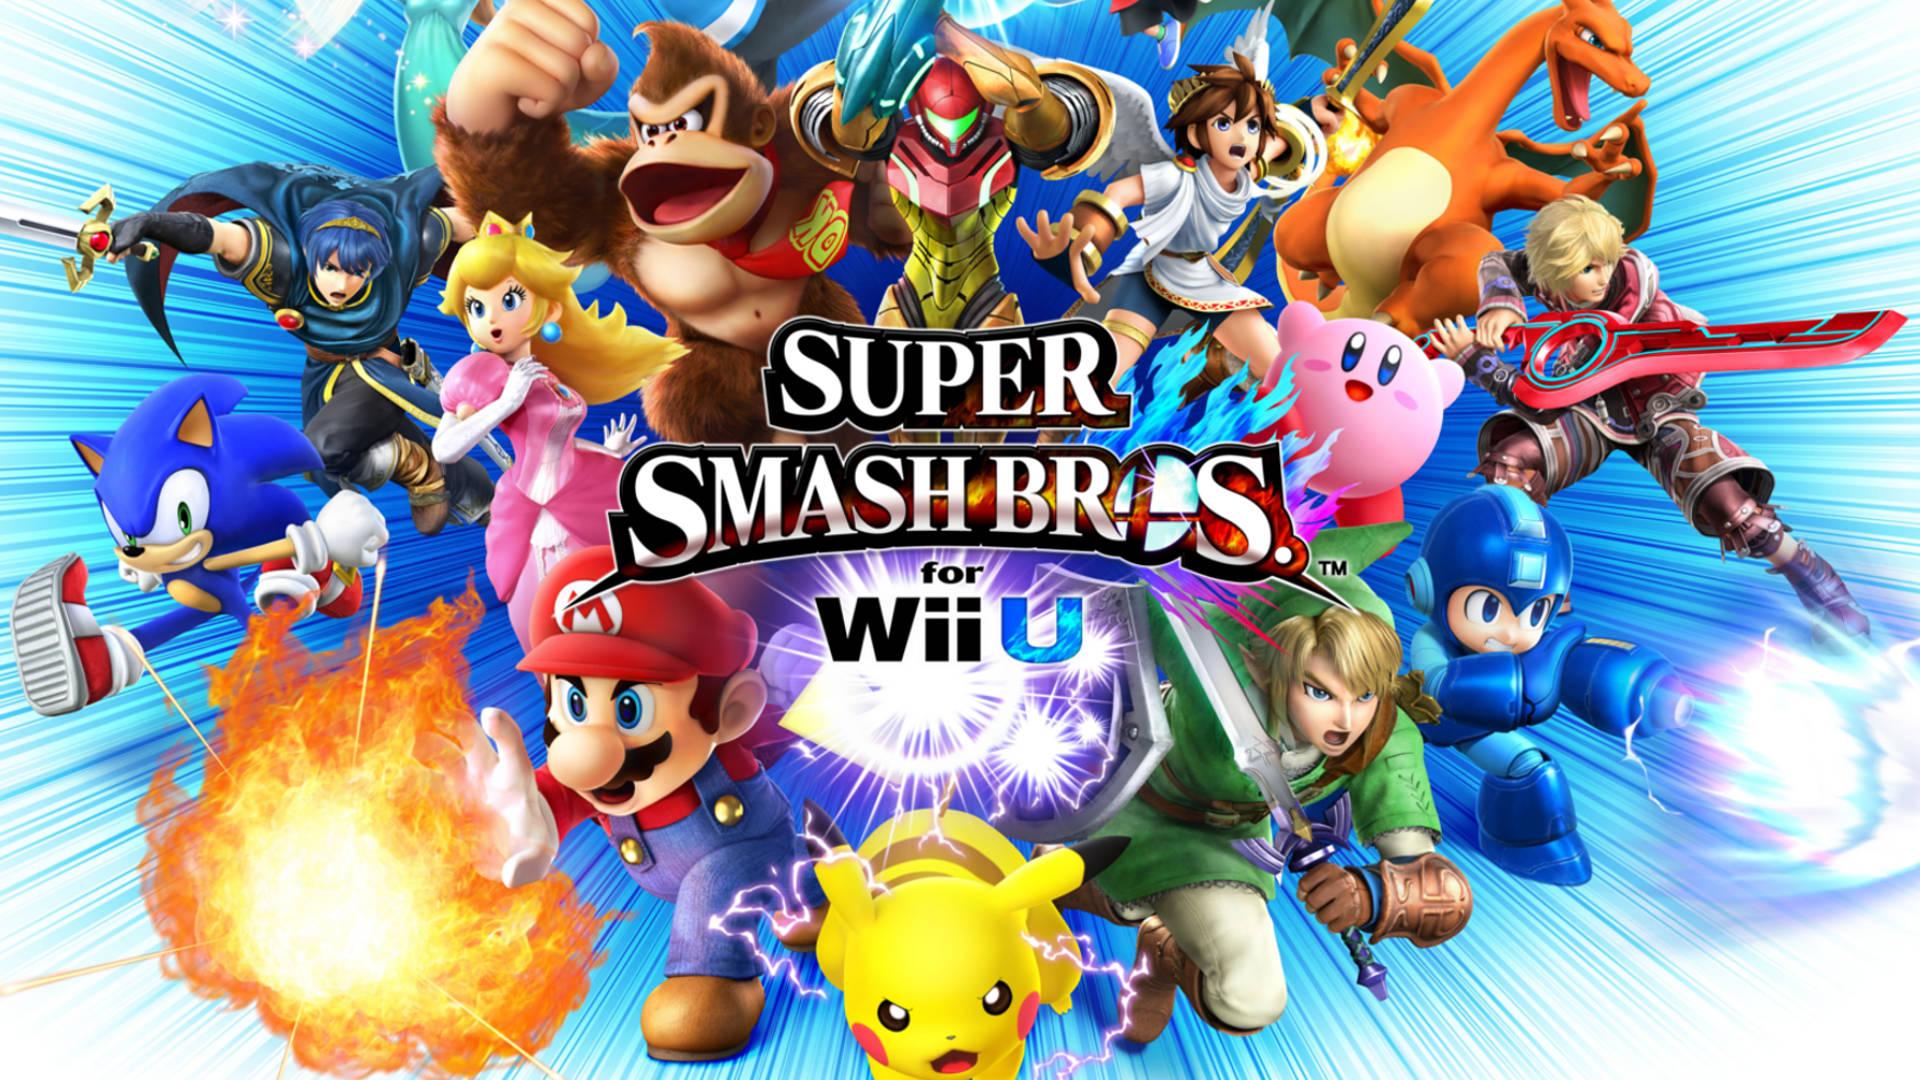 Super Smash Bros. Mania